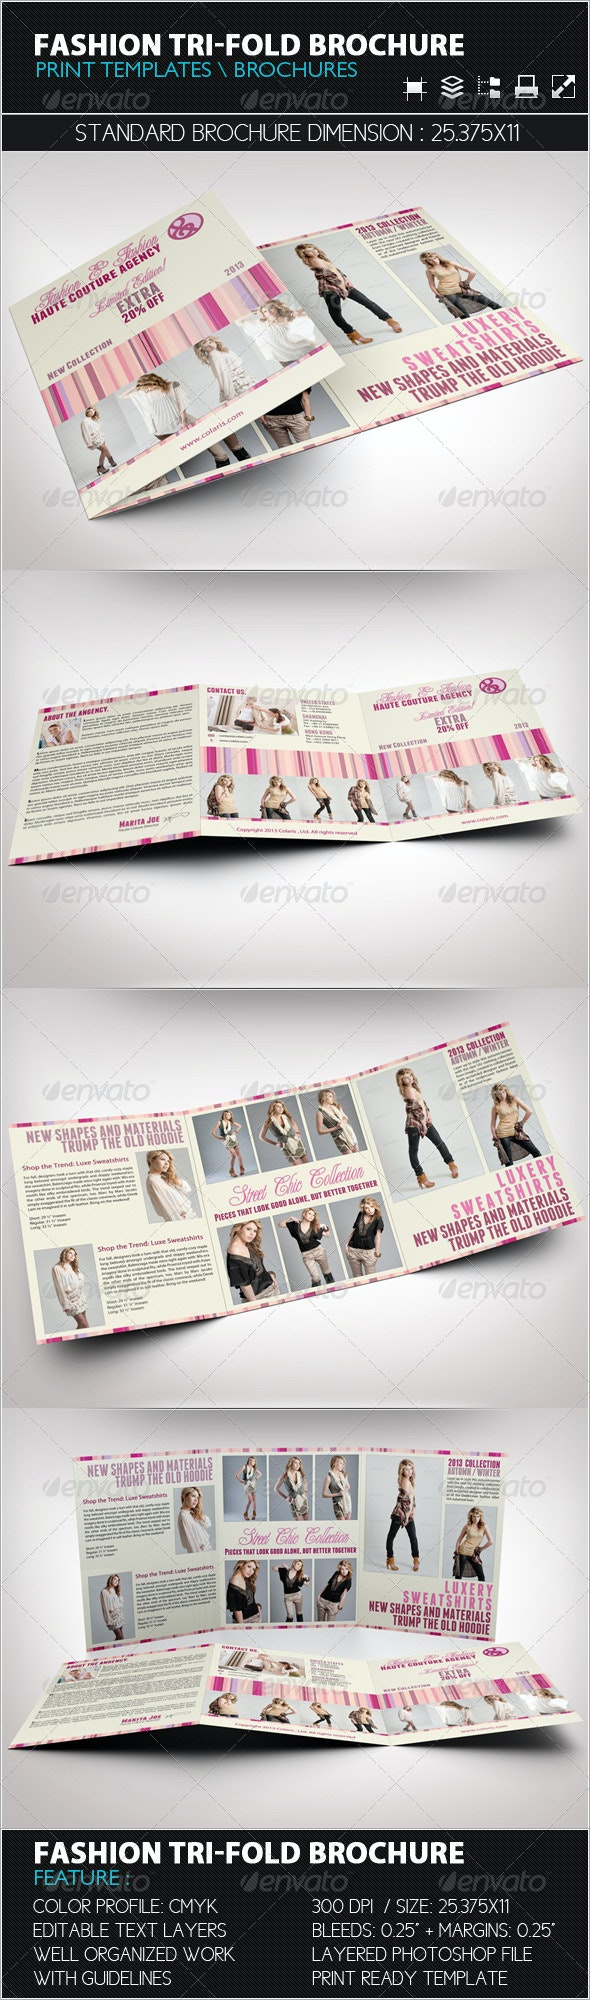 Fashion Tri-Fold Brochure Template - Catalogs Brochures